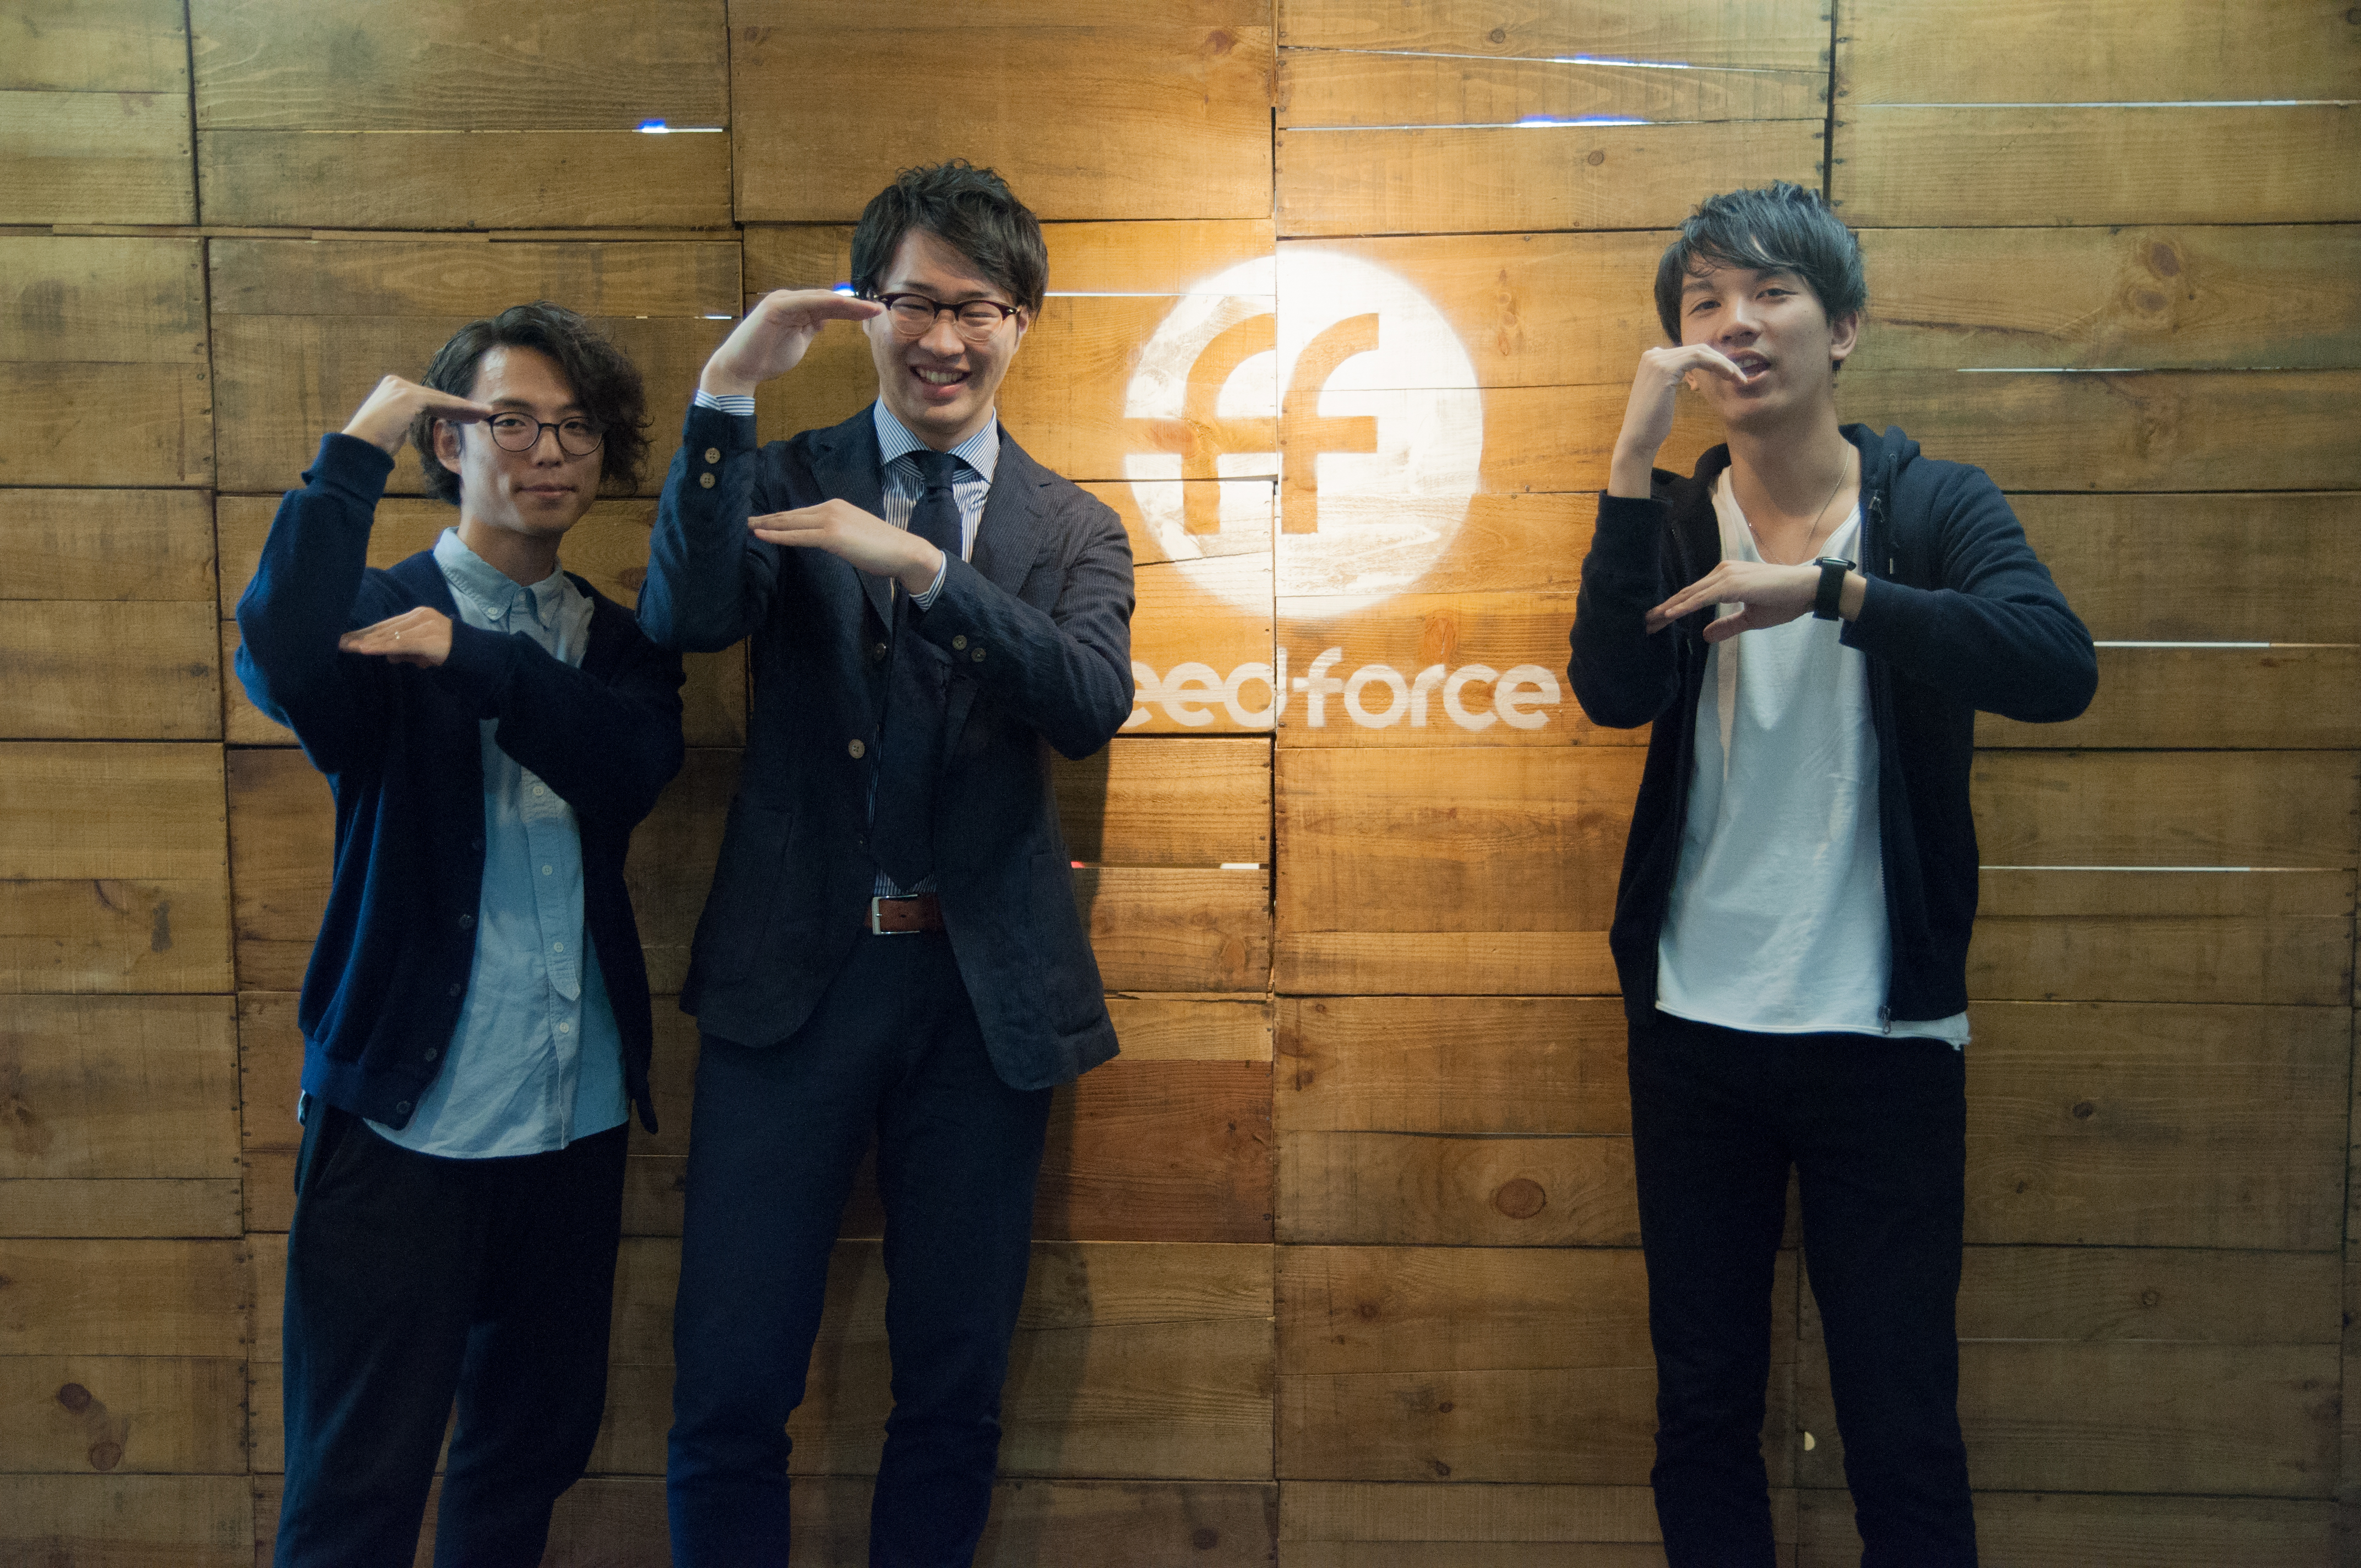 feesforce_syugou